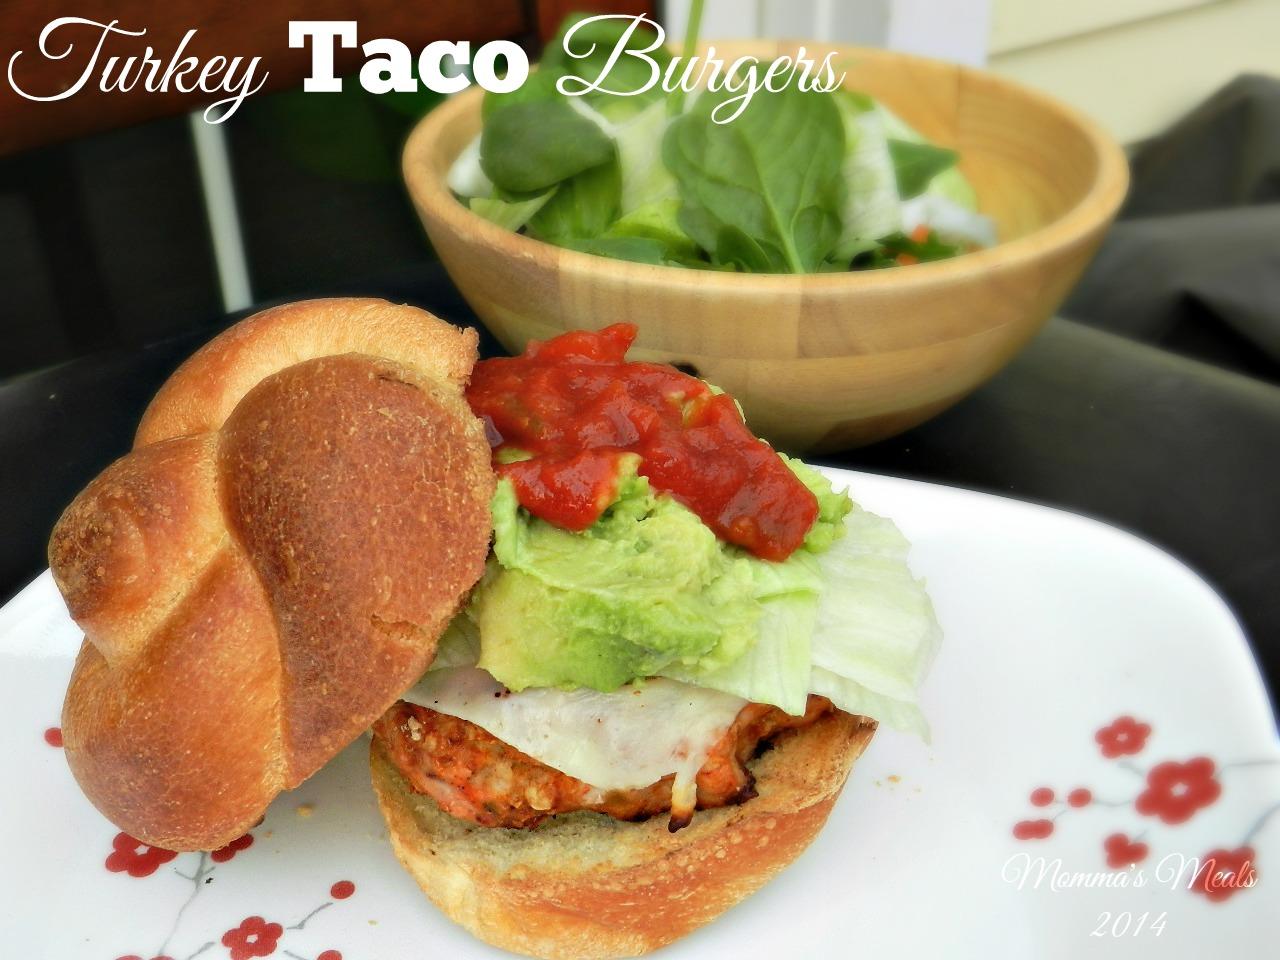 Taco Turkey Burger (5)a